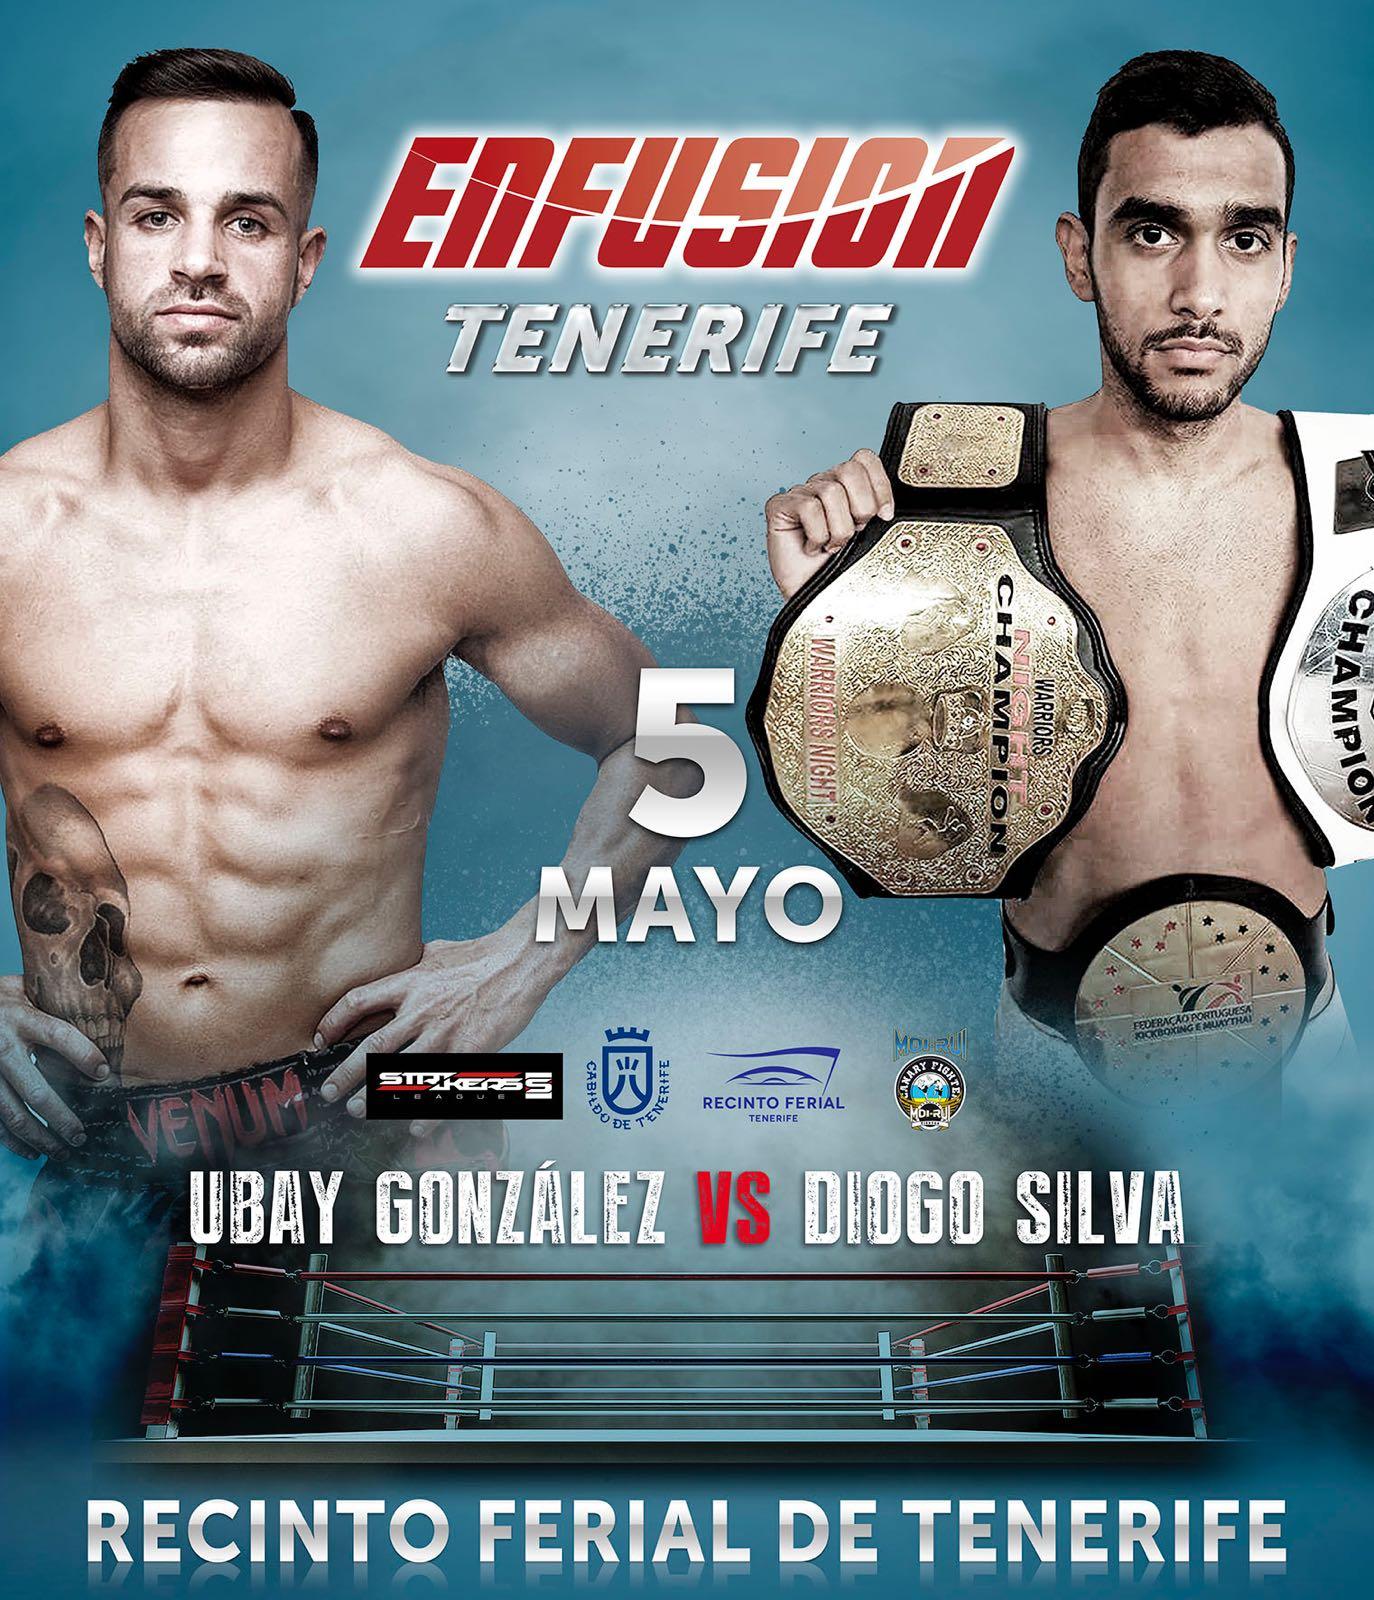 6- Ubay González Vs Diogo Silva